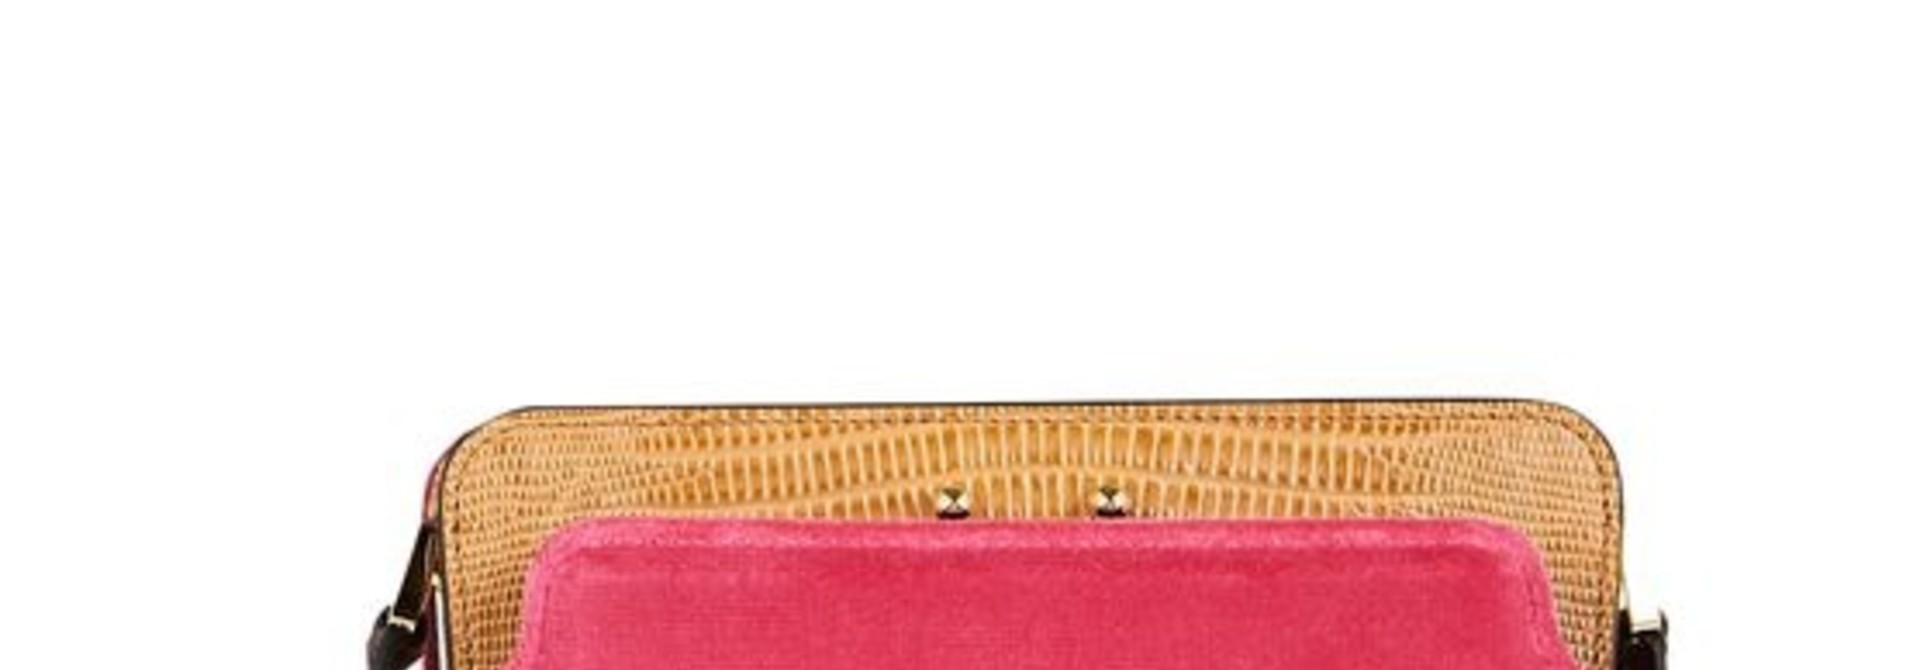 Shoulder Bag - Fushia/Beige